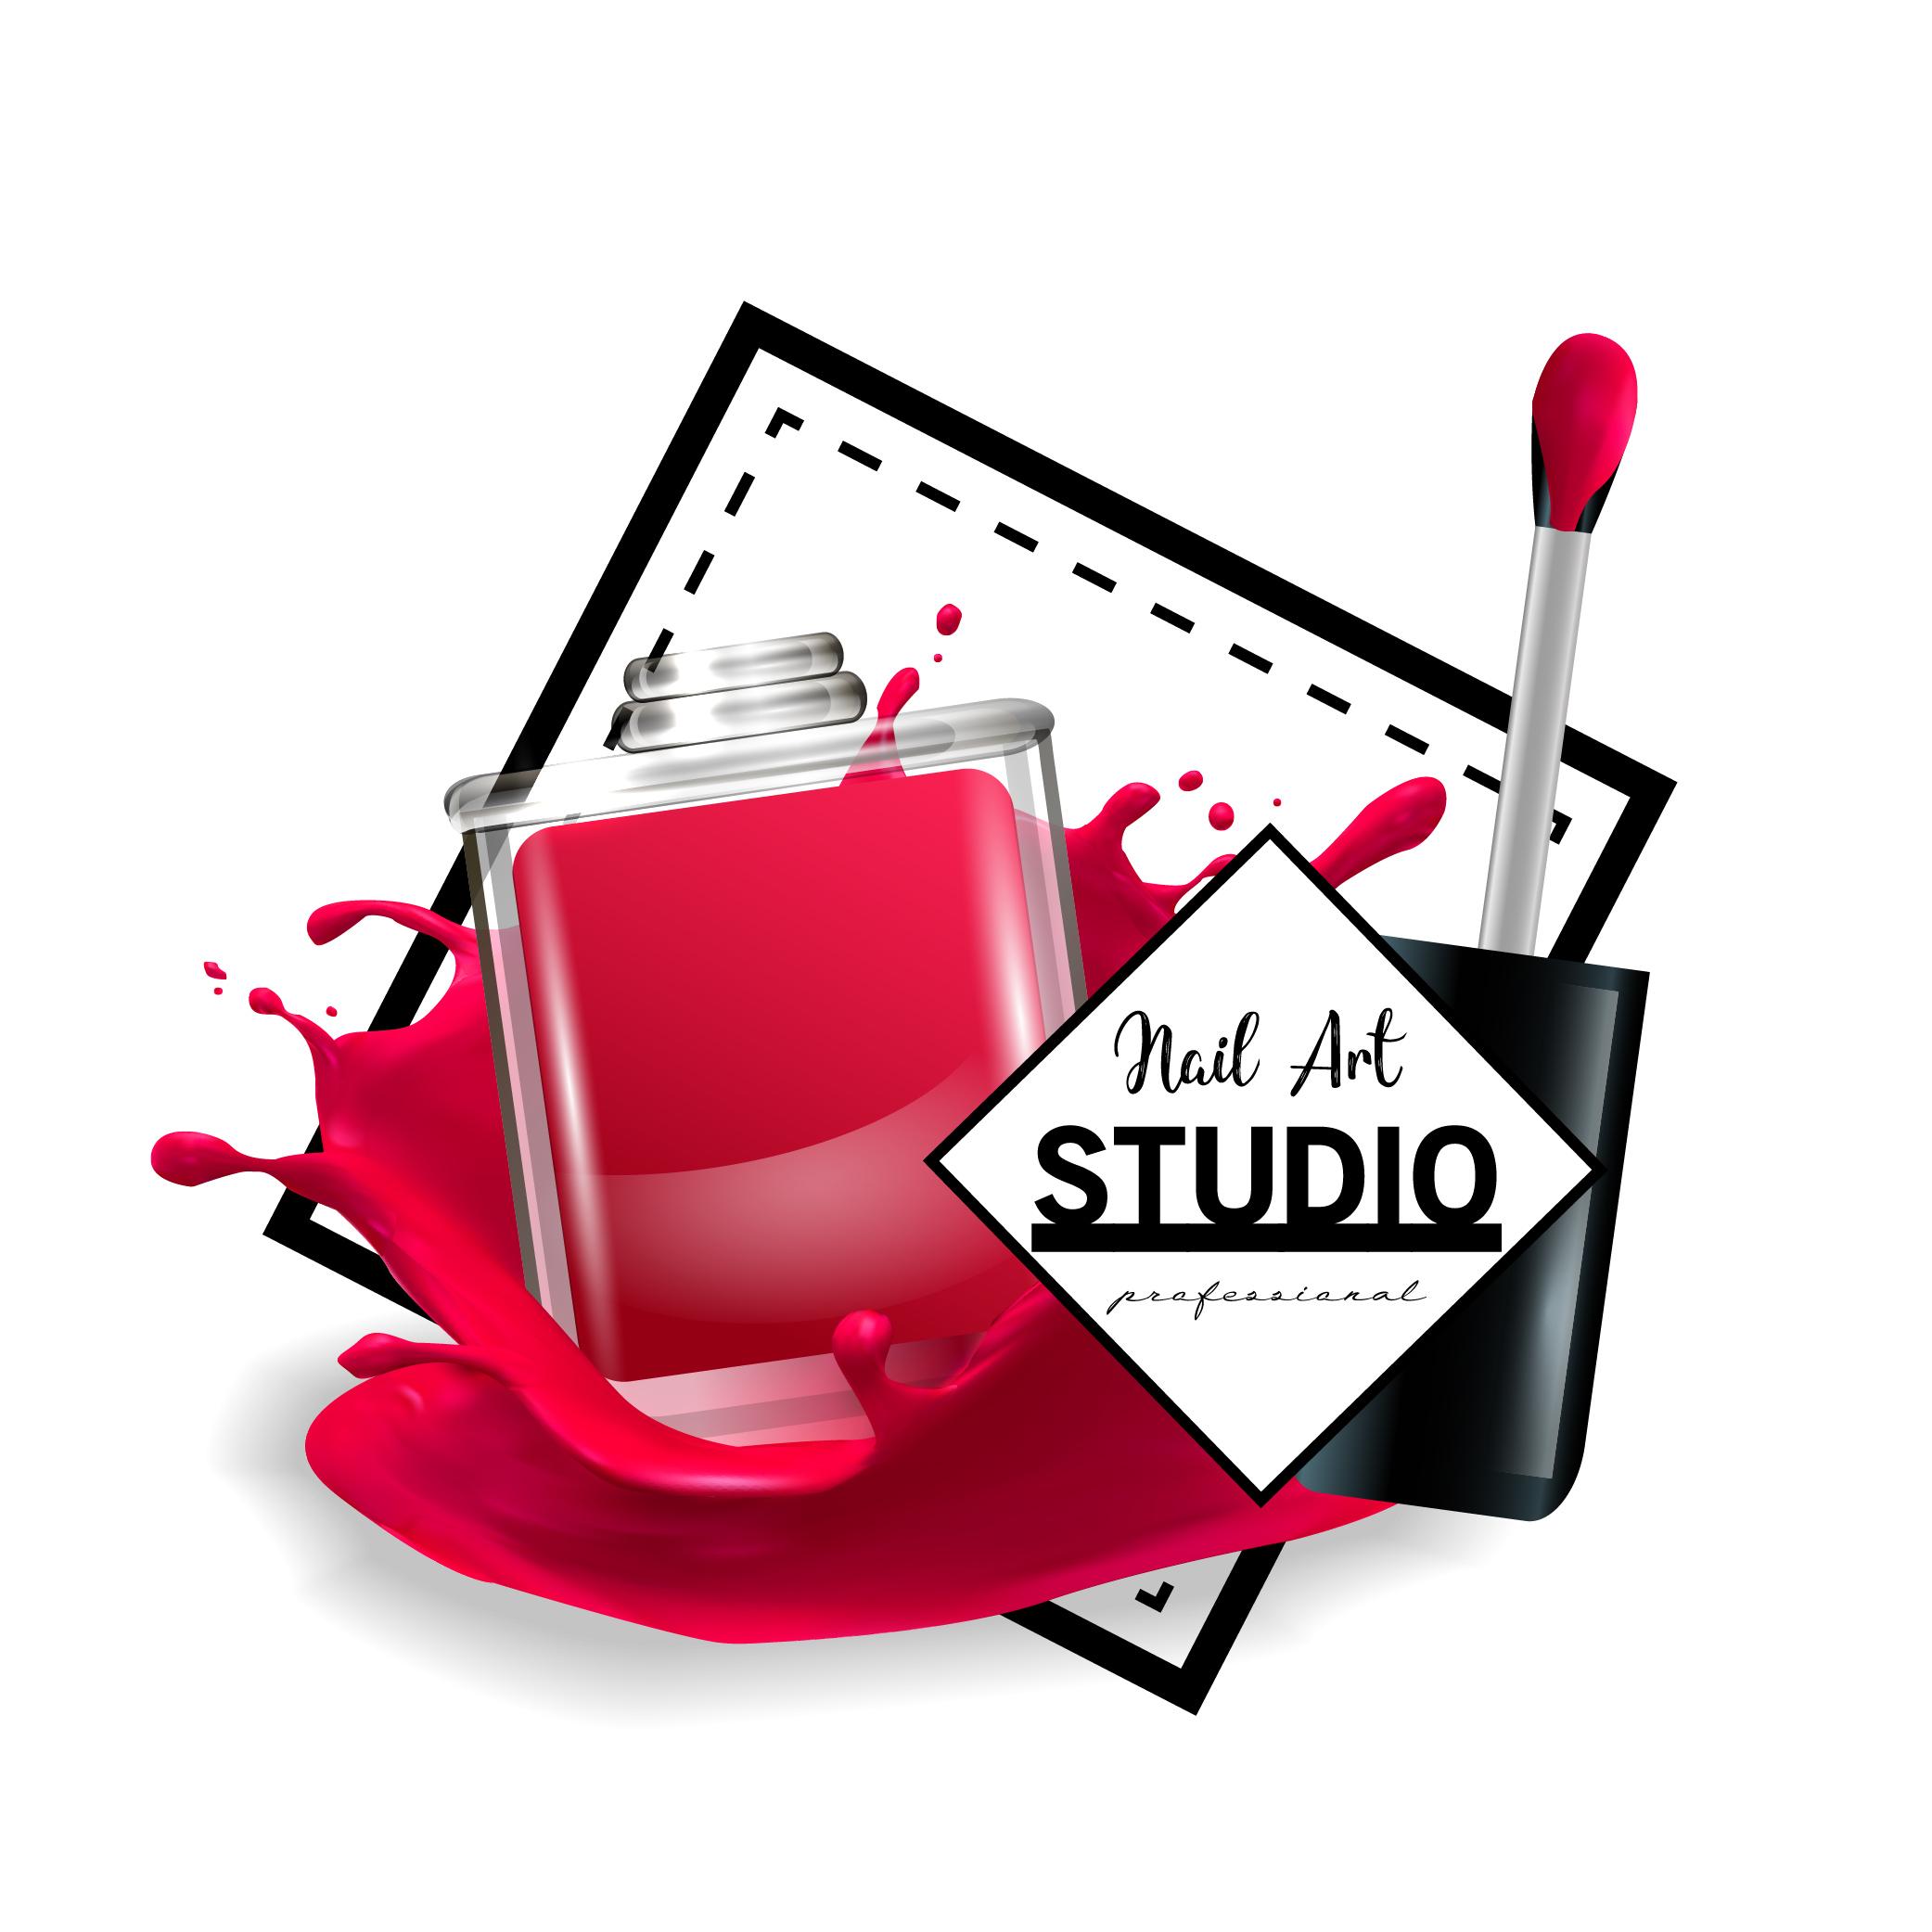 Nail Art Vector: Nail Art Studio Logo Design Template.